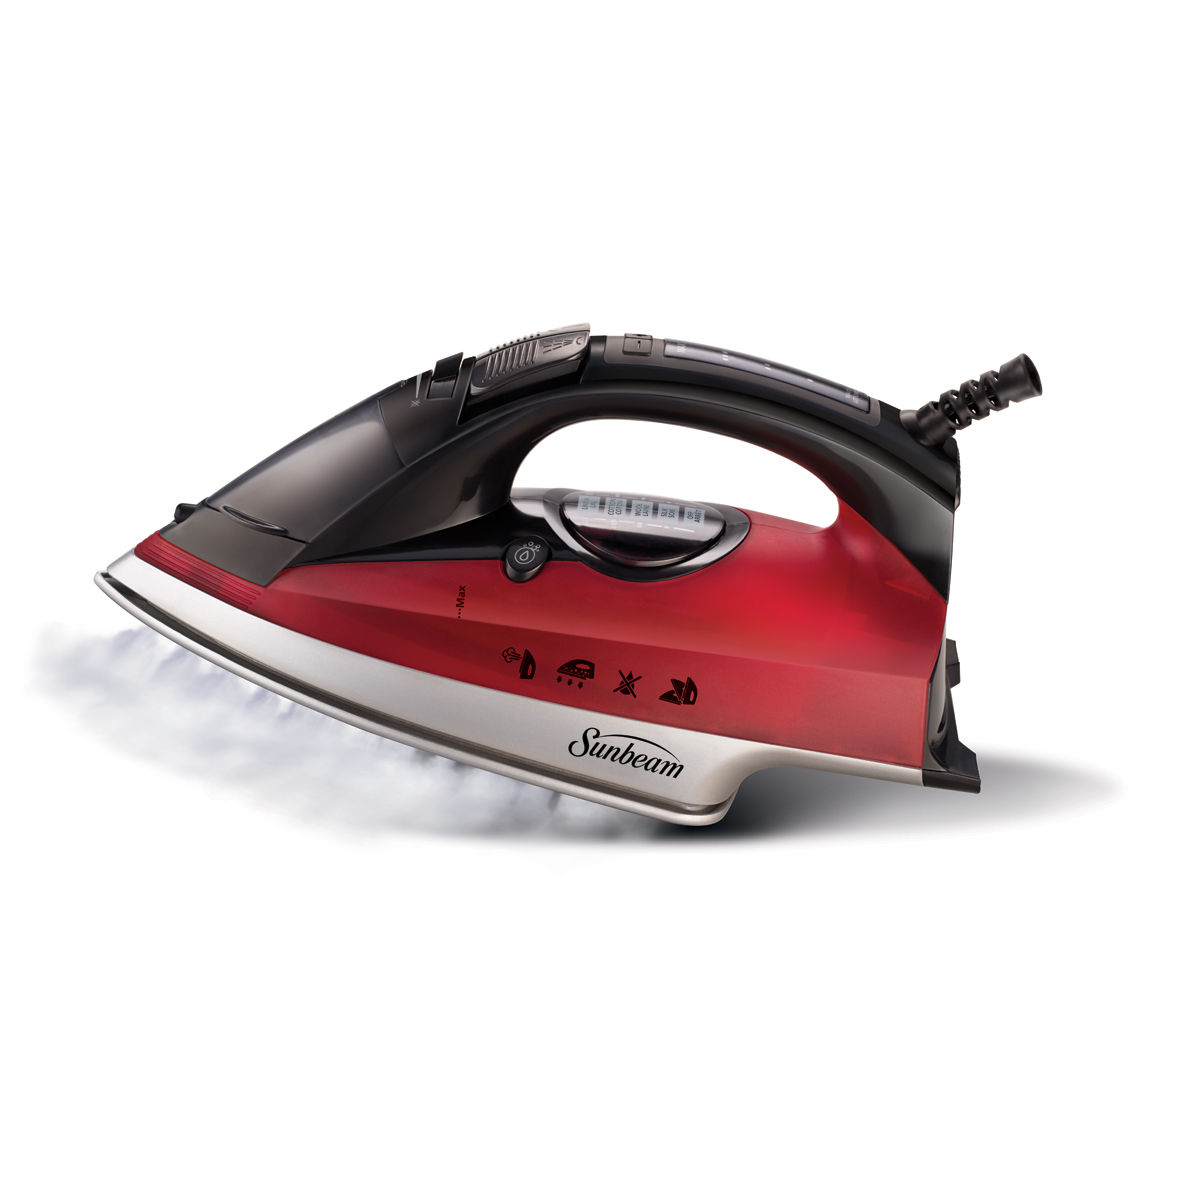 Sunbeam® Steam Master® Digital Iron, Red & Black